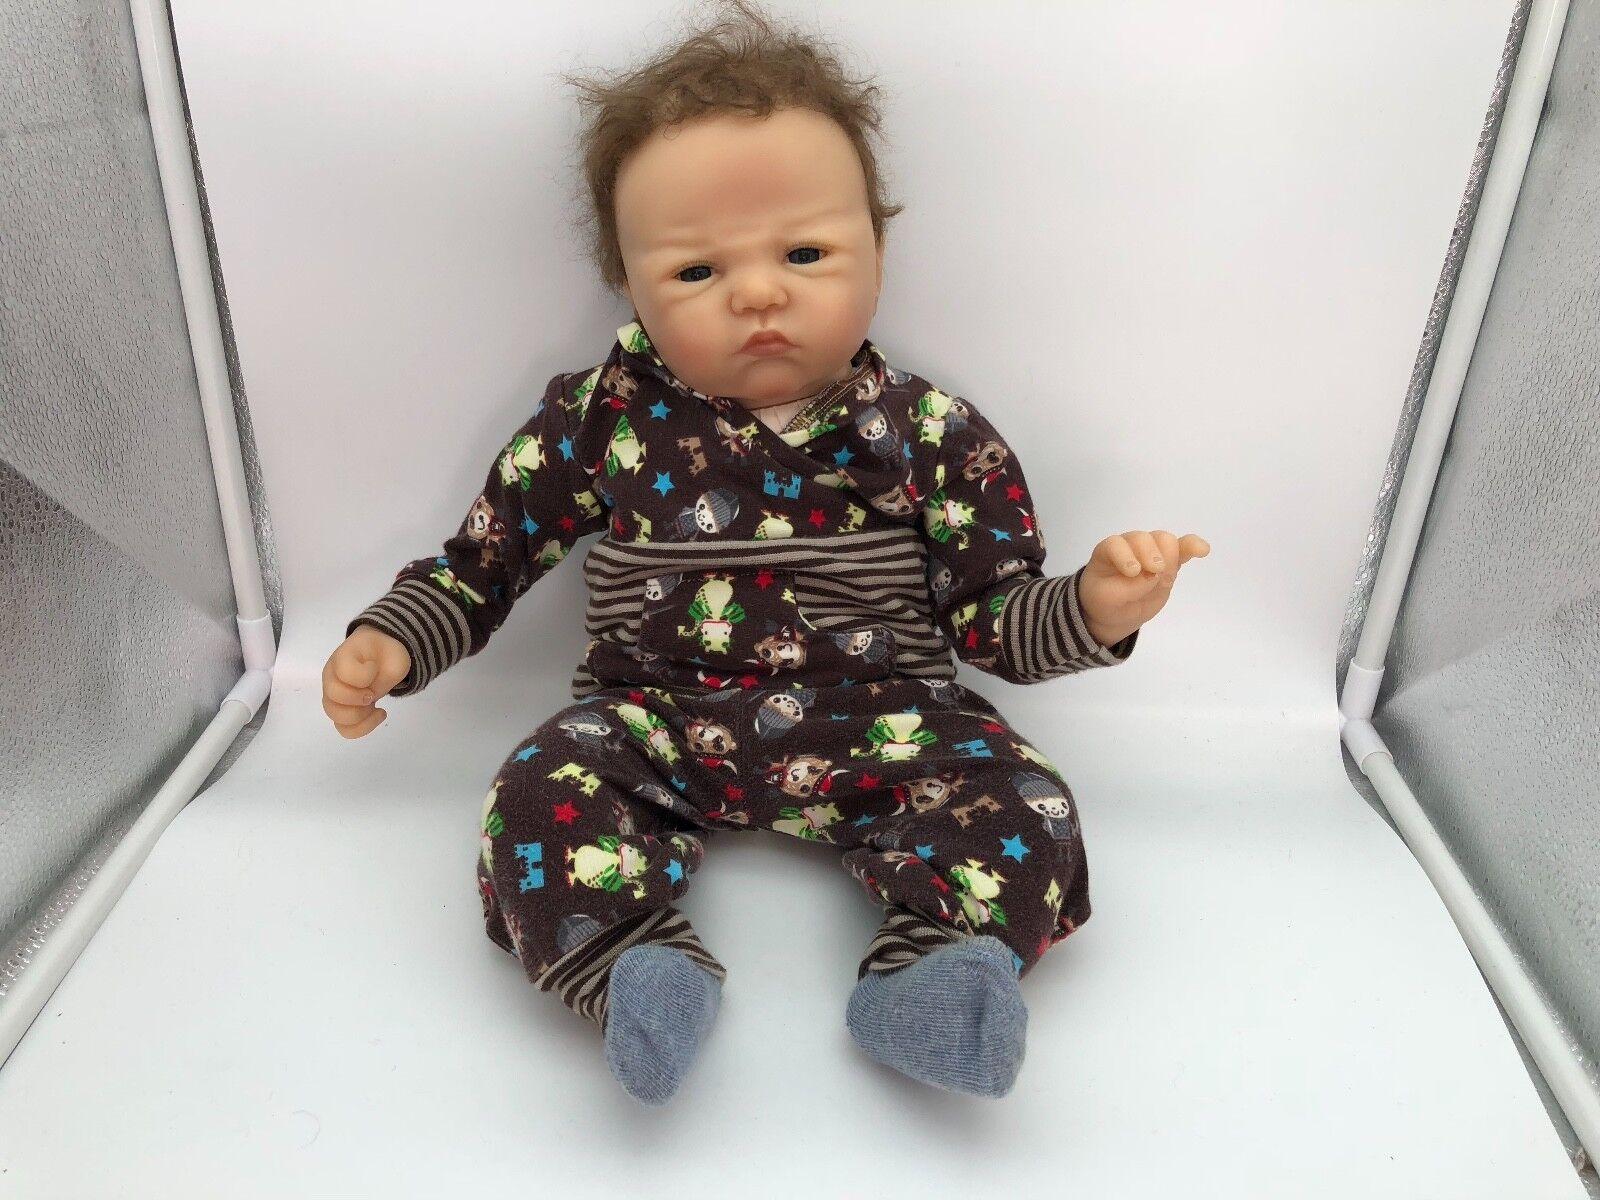 Sandy Faber ⭐️⭐️ Vinyl Puppe Puppe Puppe 47 cm. ⭐️⭐️ Top Zustand 463c6d